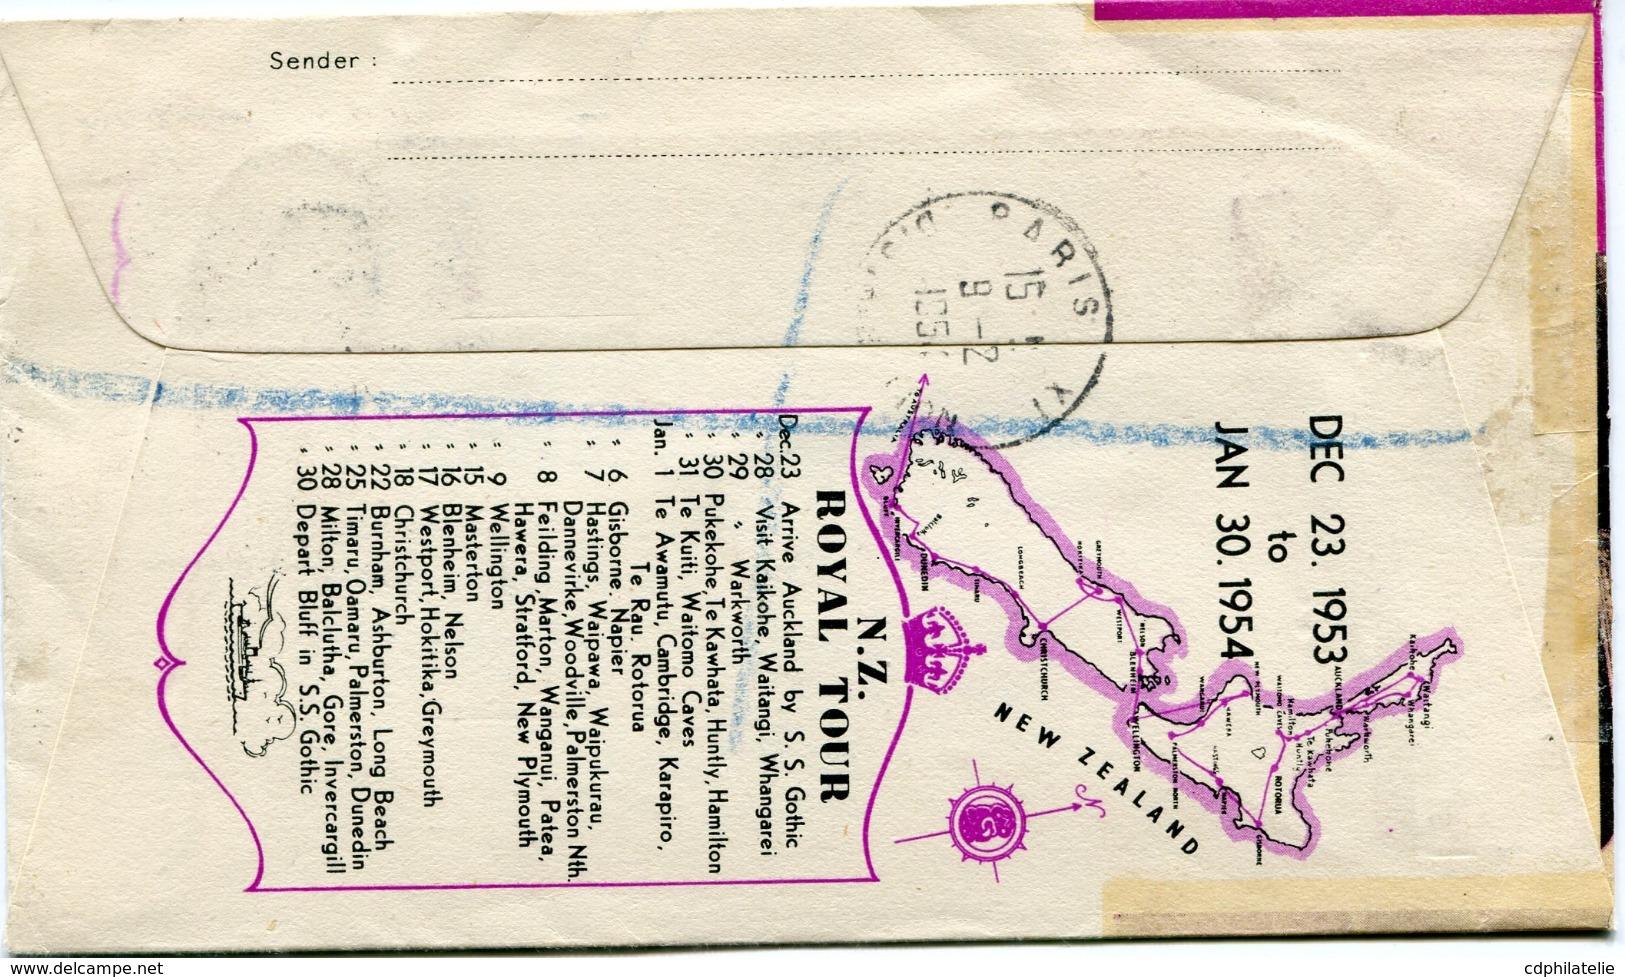 "NOUVELLE-ZELANDE ENVELOPPE RECOMMANDEE ""ROYAL VISIT 1953-1954"" DEPART CHRISTCHURCH 3 FE 54 POUR LA FRANCE - Briefe U. Dokumente"